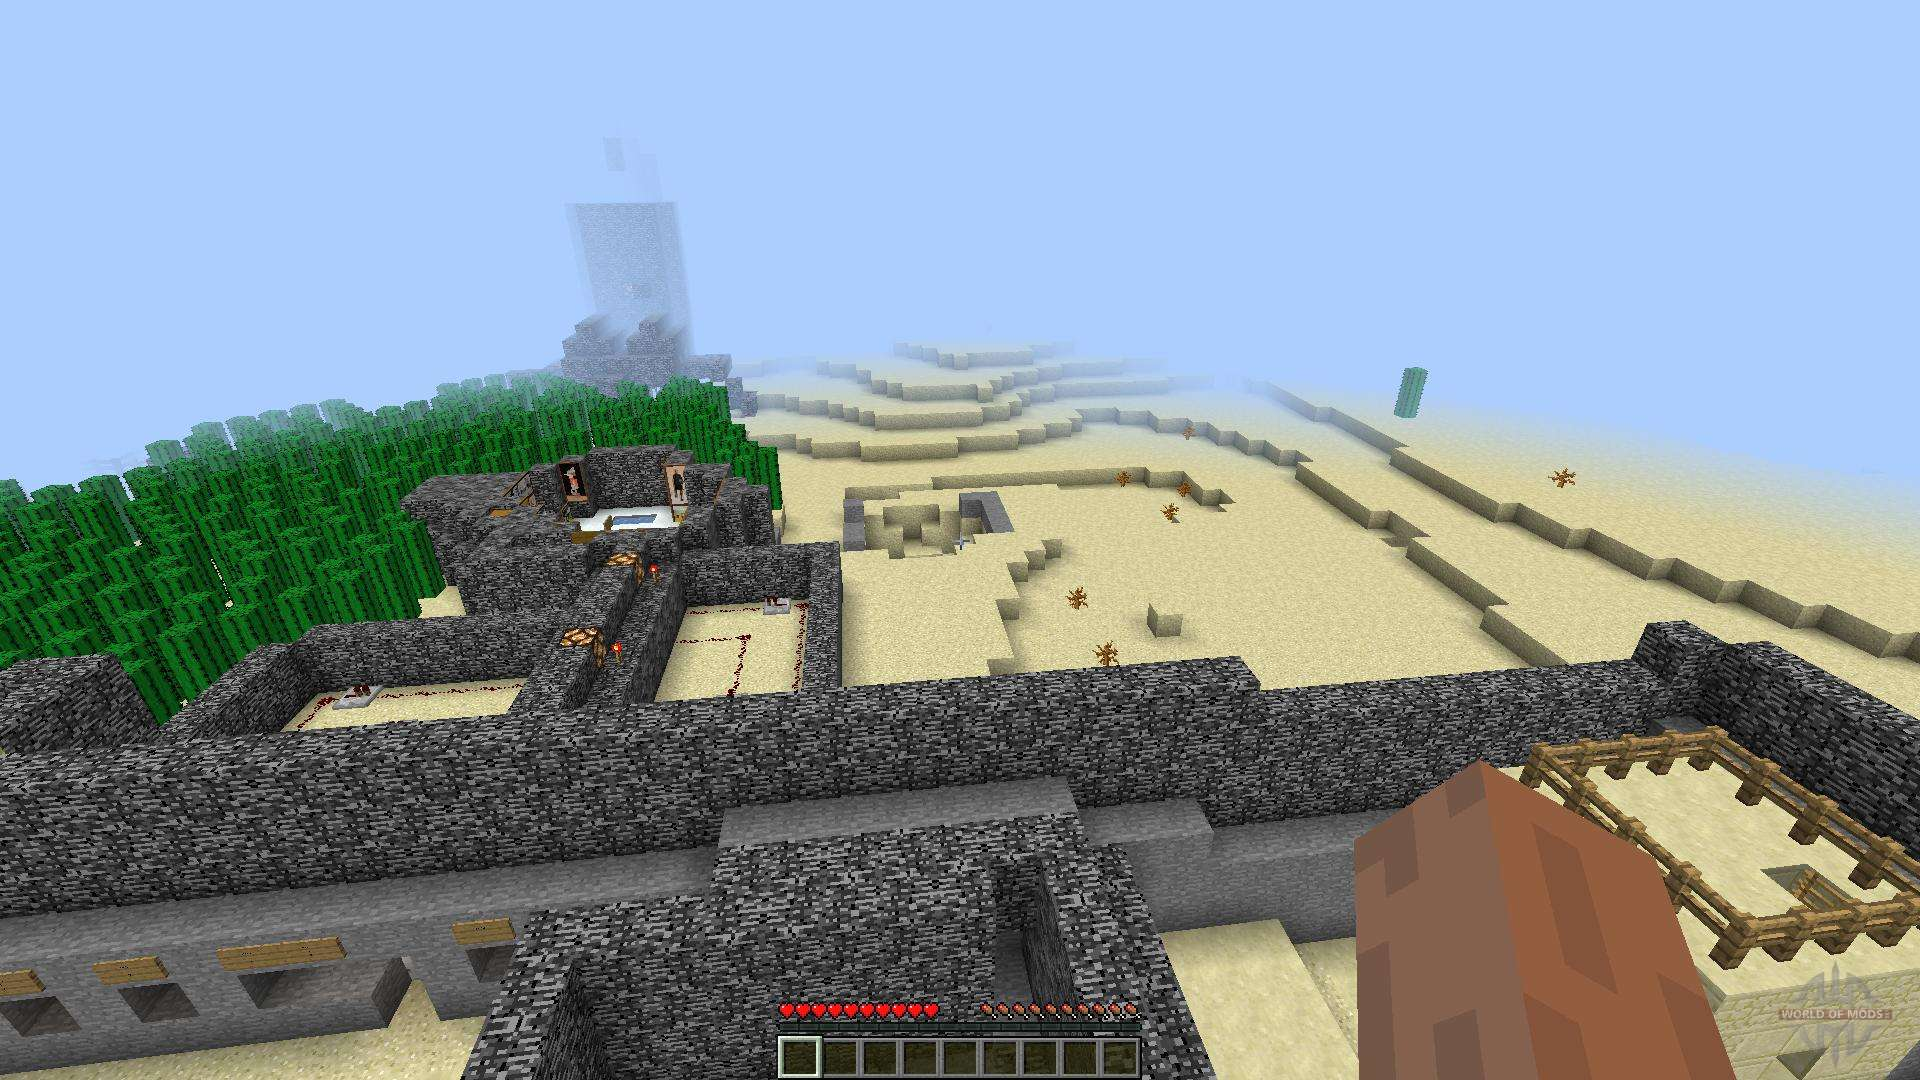 minecraft map 1.8.8